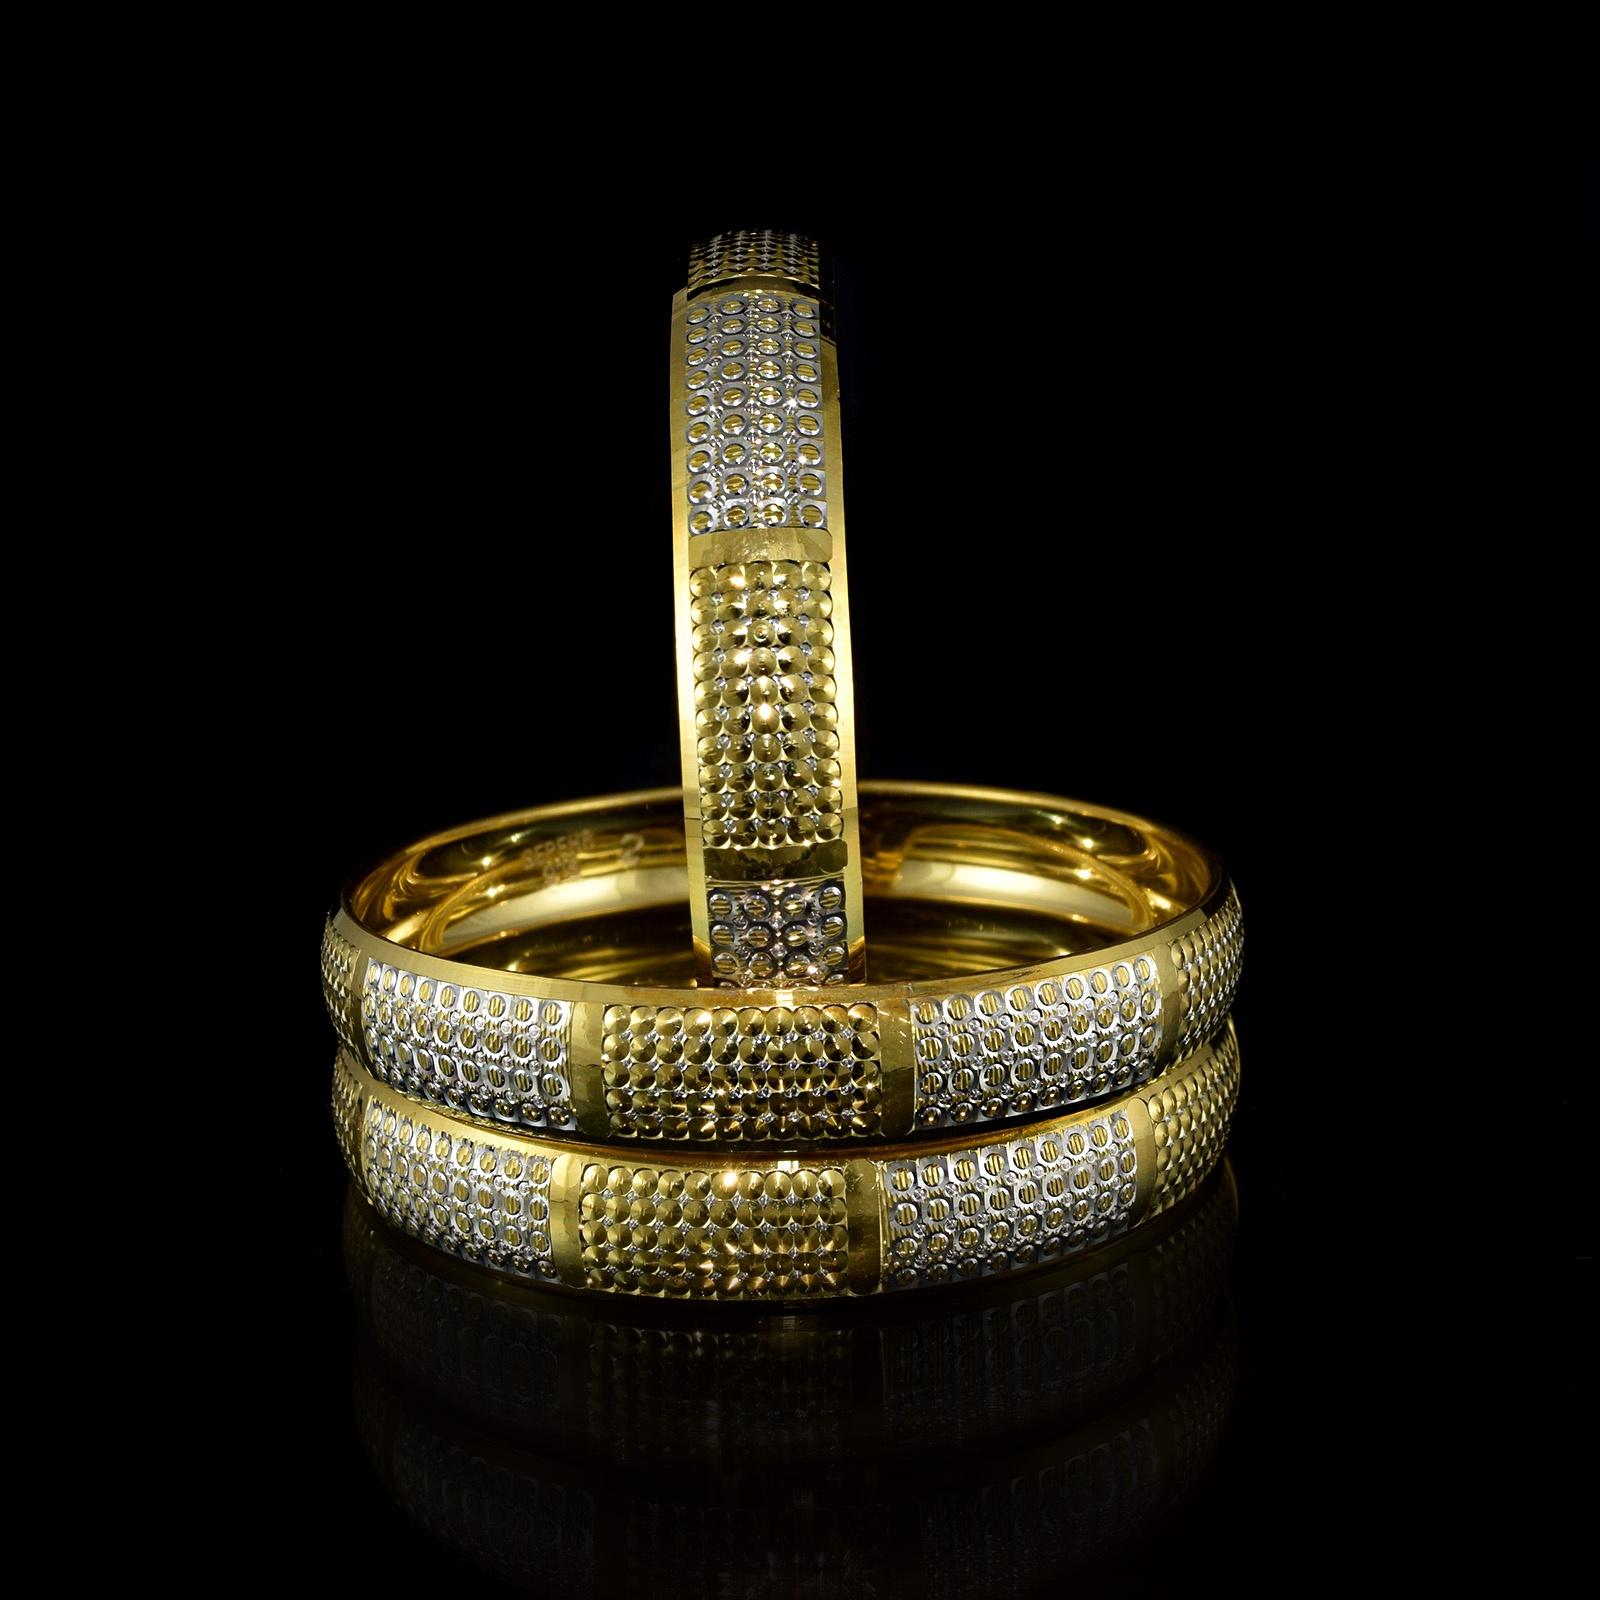 النگو نقره زنانه دو رنگ طرح طلا al-n106